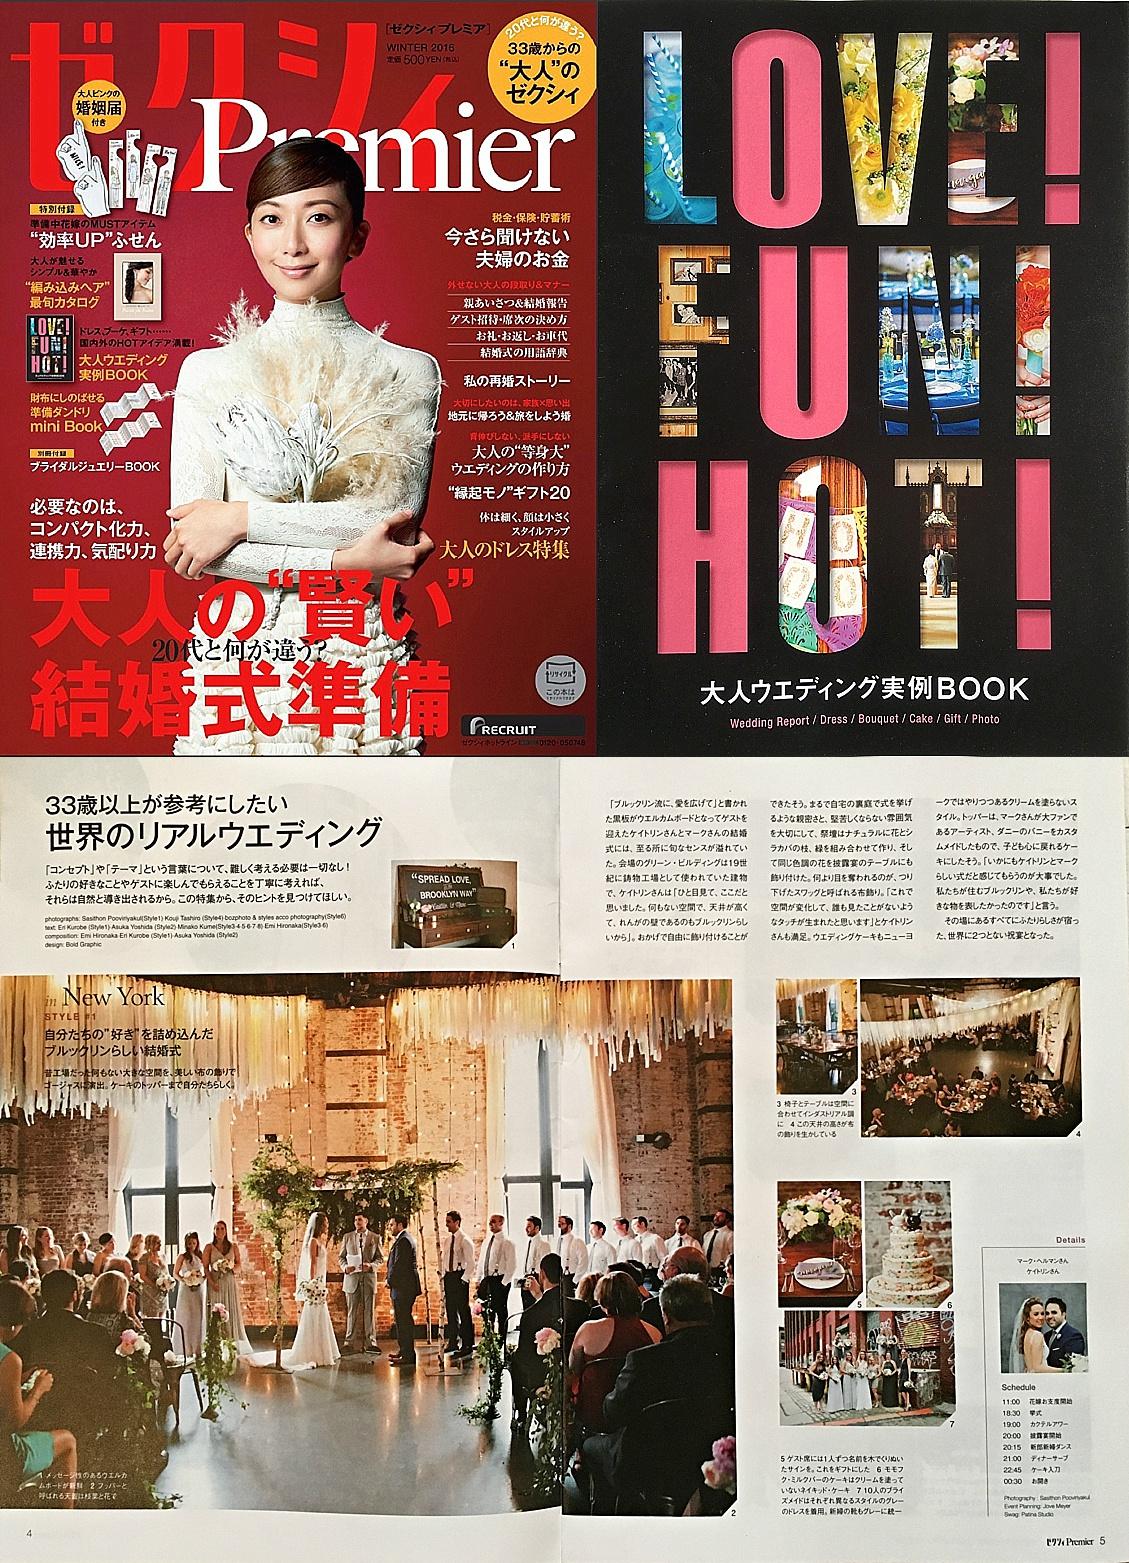 jove meyer events featured in japanese magazine.jpg